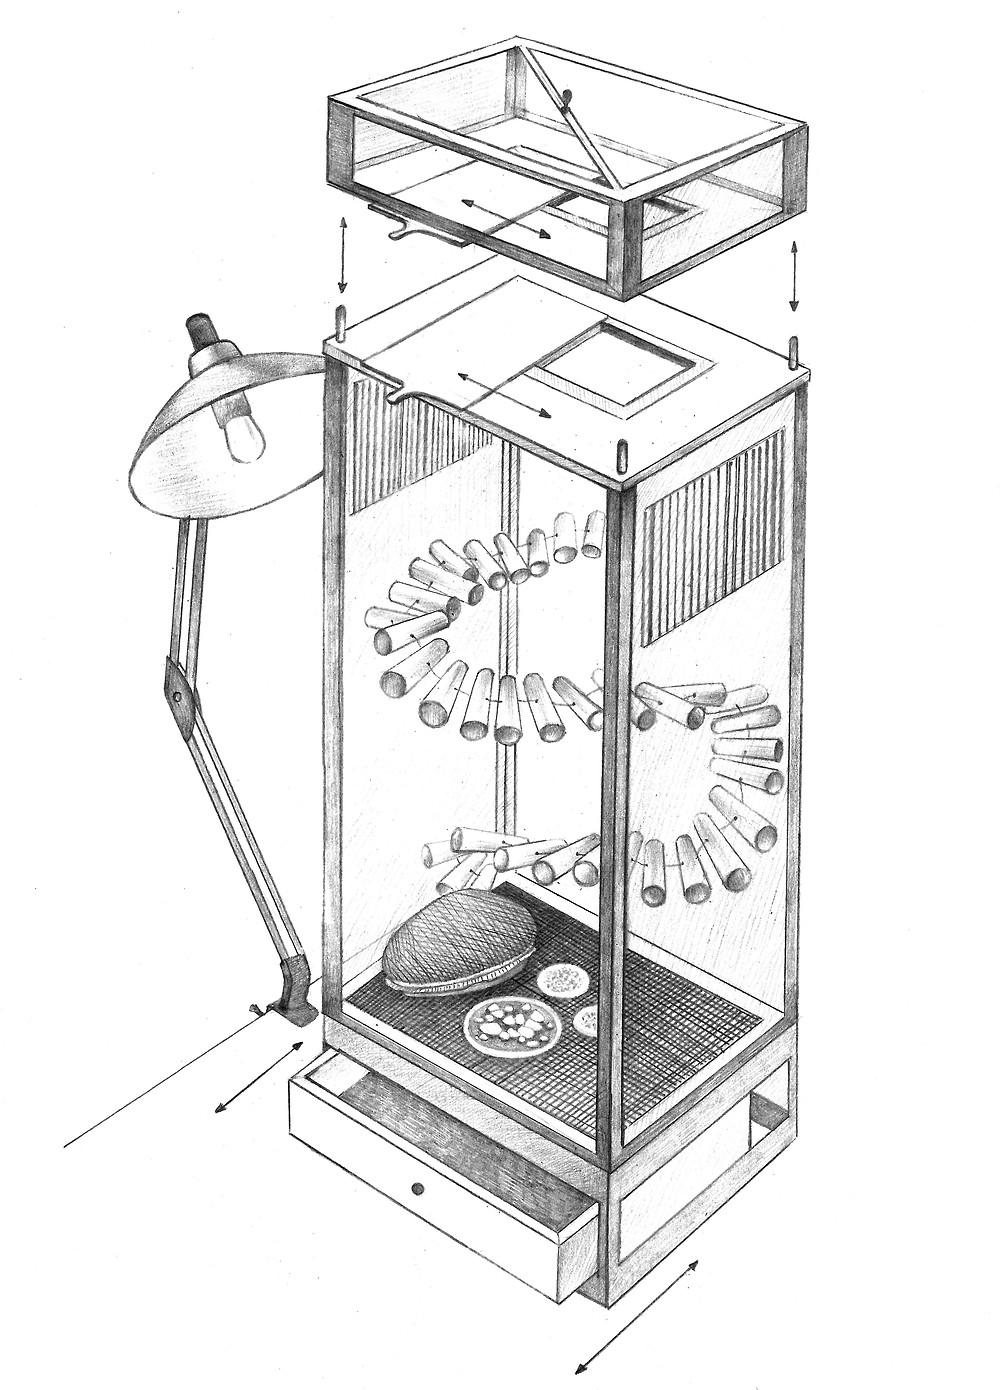 a cricket coop prototype